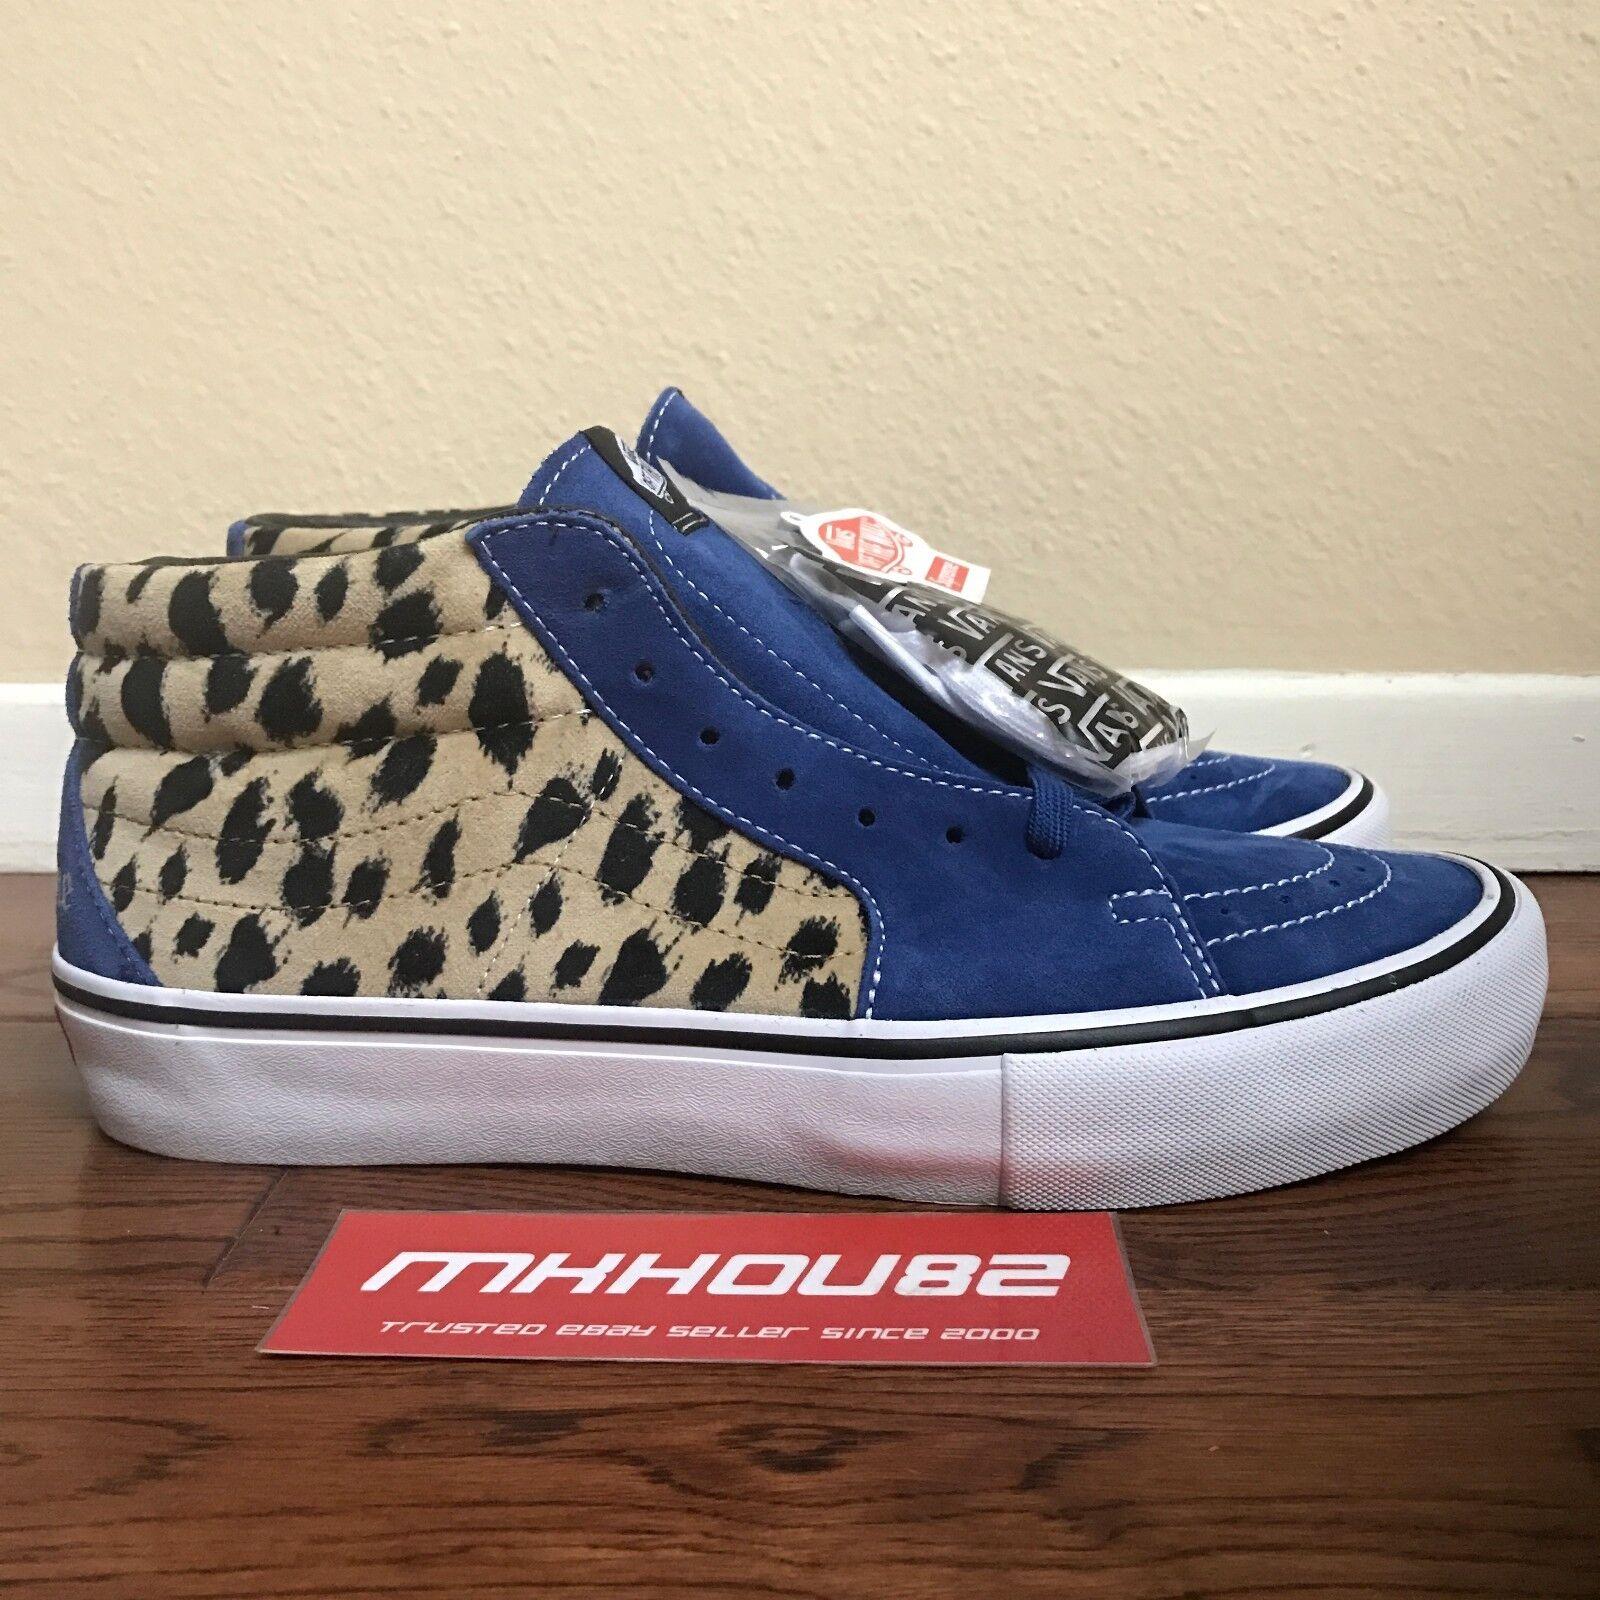 New Supreme Vans Sk8-Mid Pro Velvet Cheetah Leopard Skateboard Shoes Size 10.5